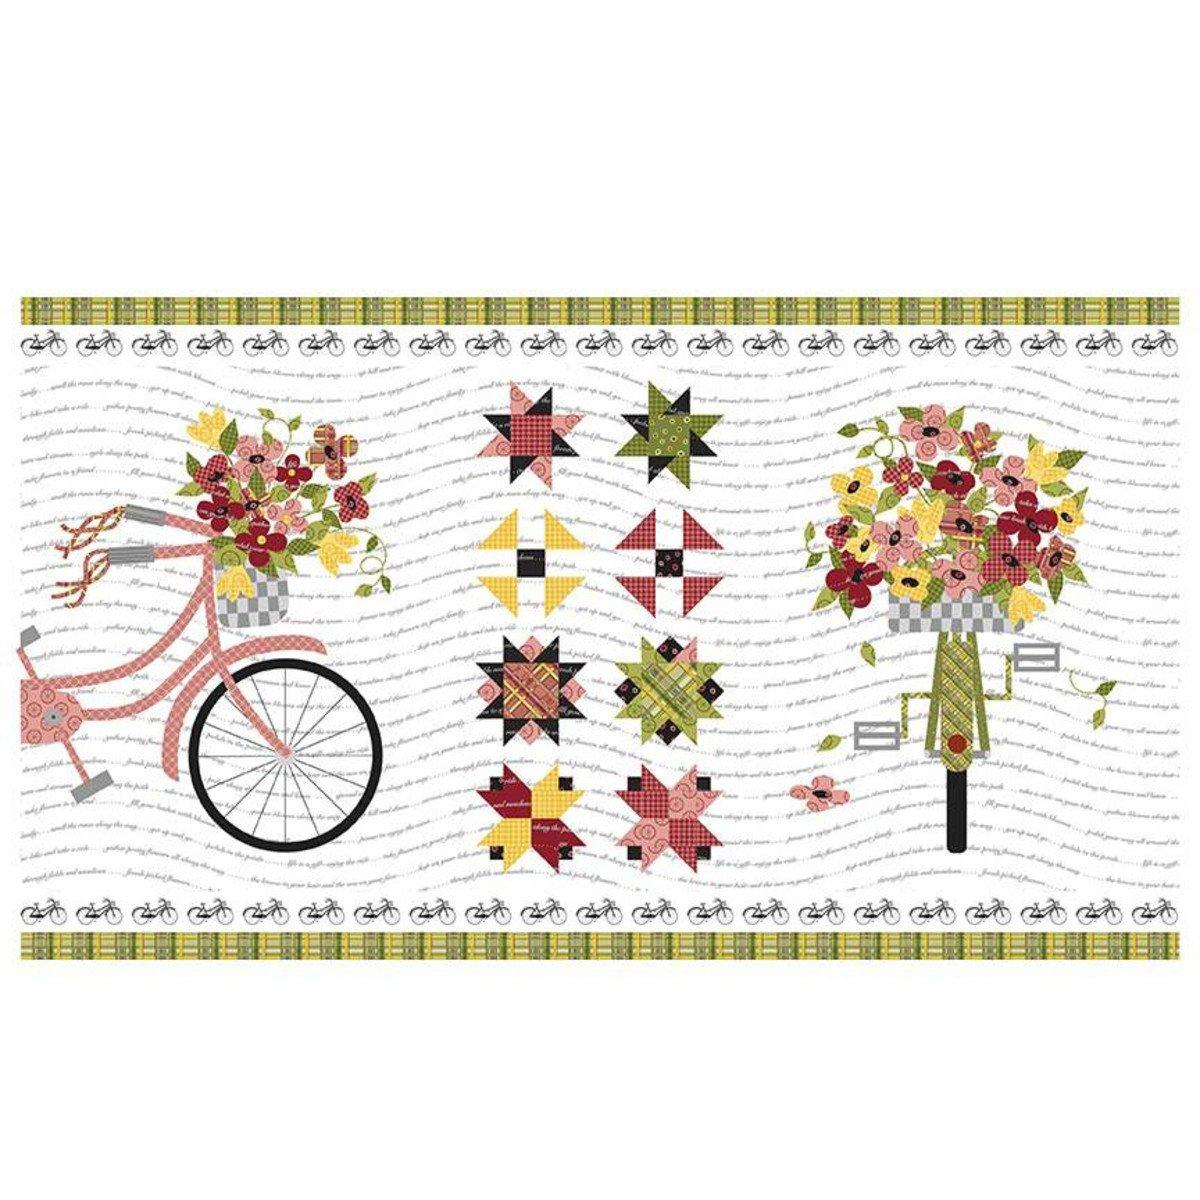 Petals & Pedals Panel - White